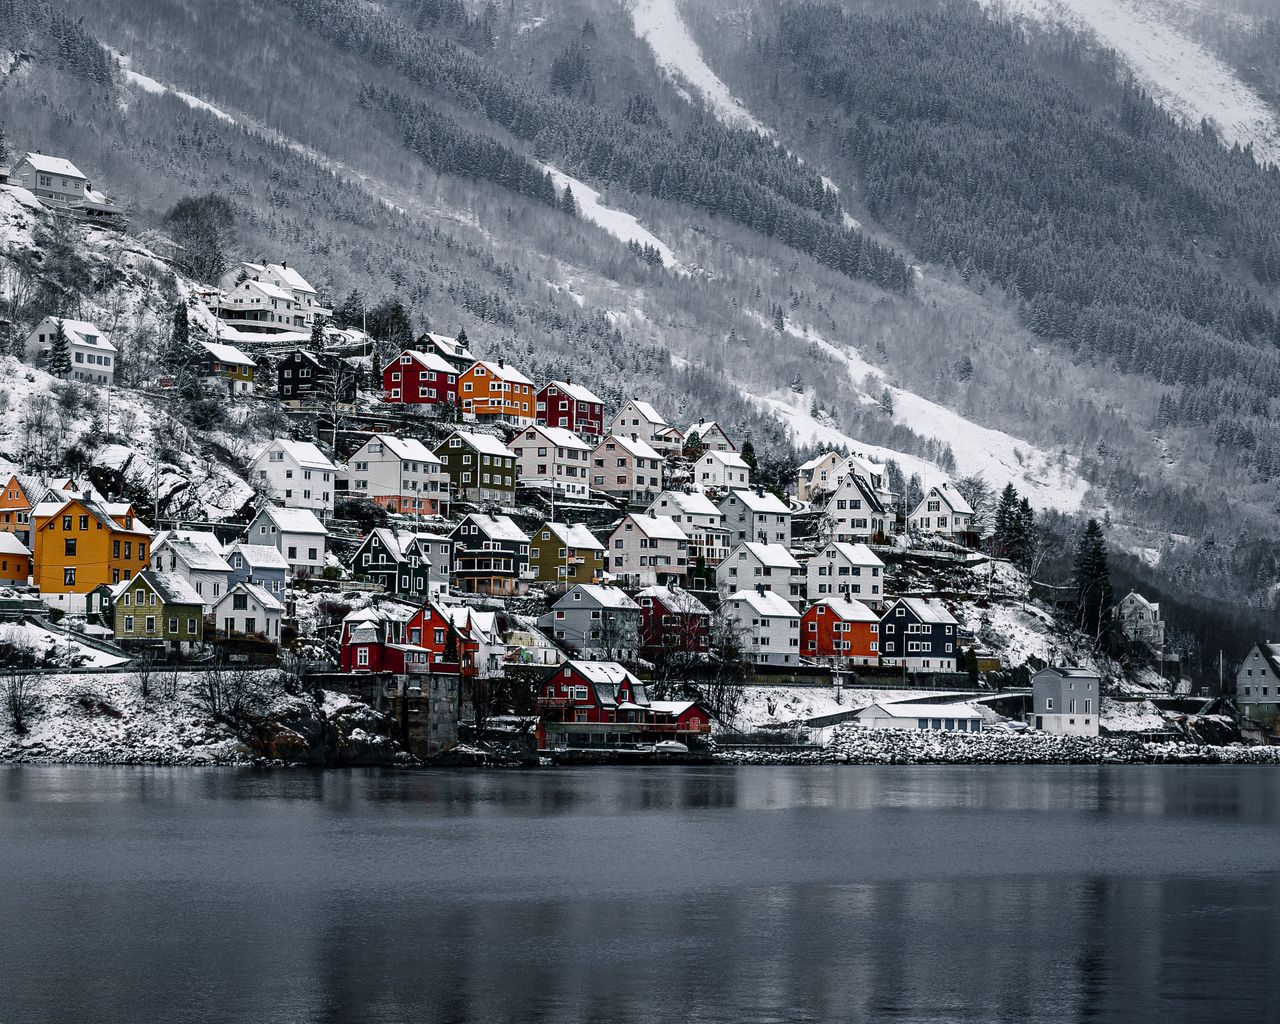 1280x1024 Wallpaper shore, house, water, lake, peak